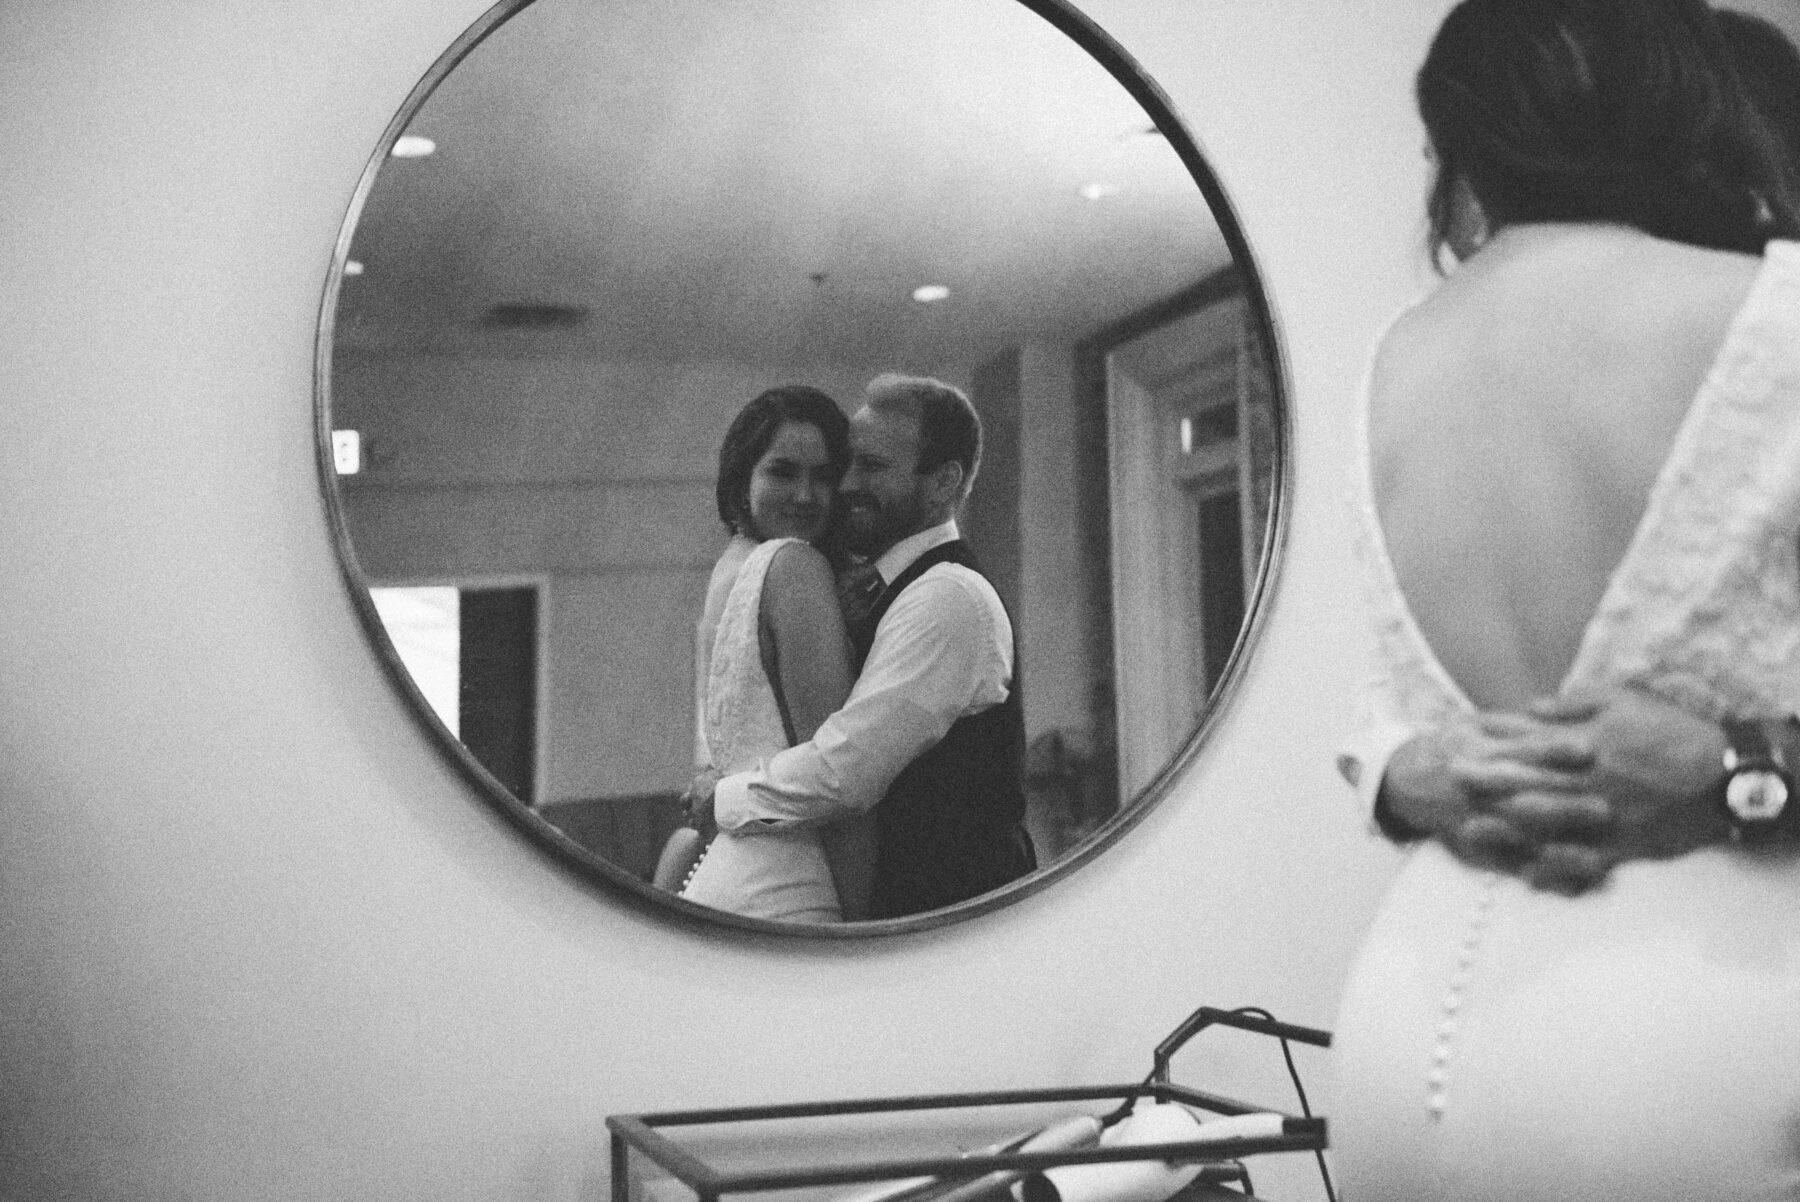 Timeless Wedding Photography | Nashville Bride Guide